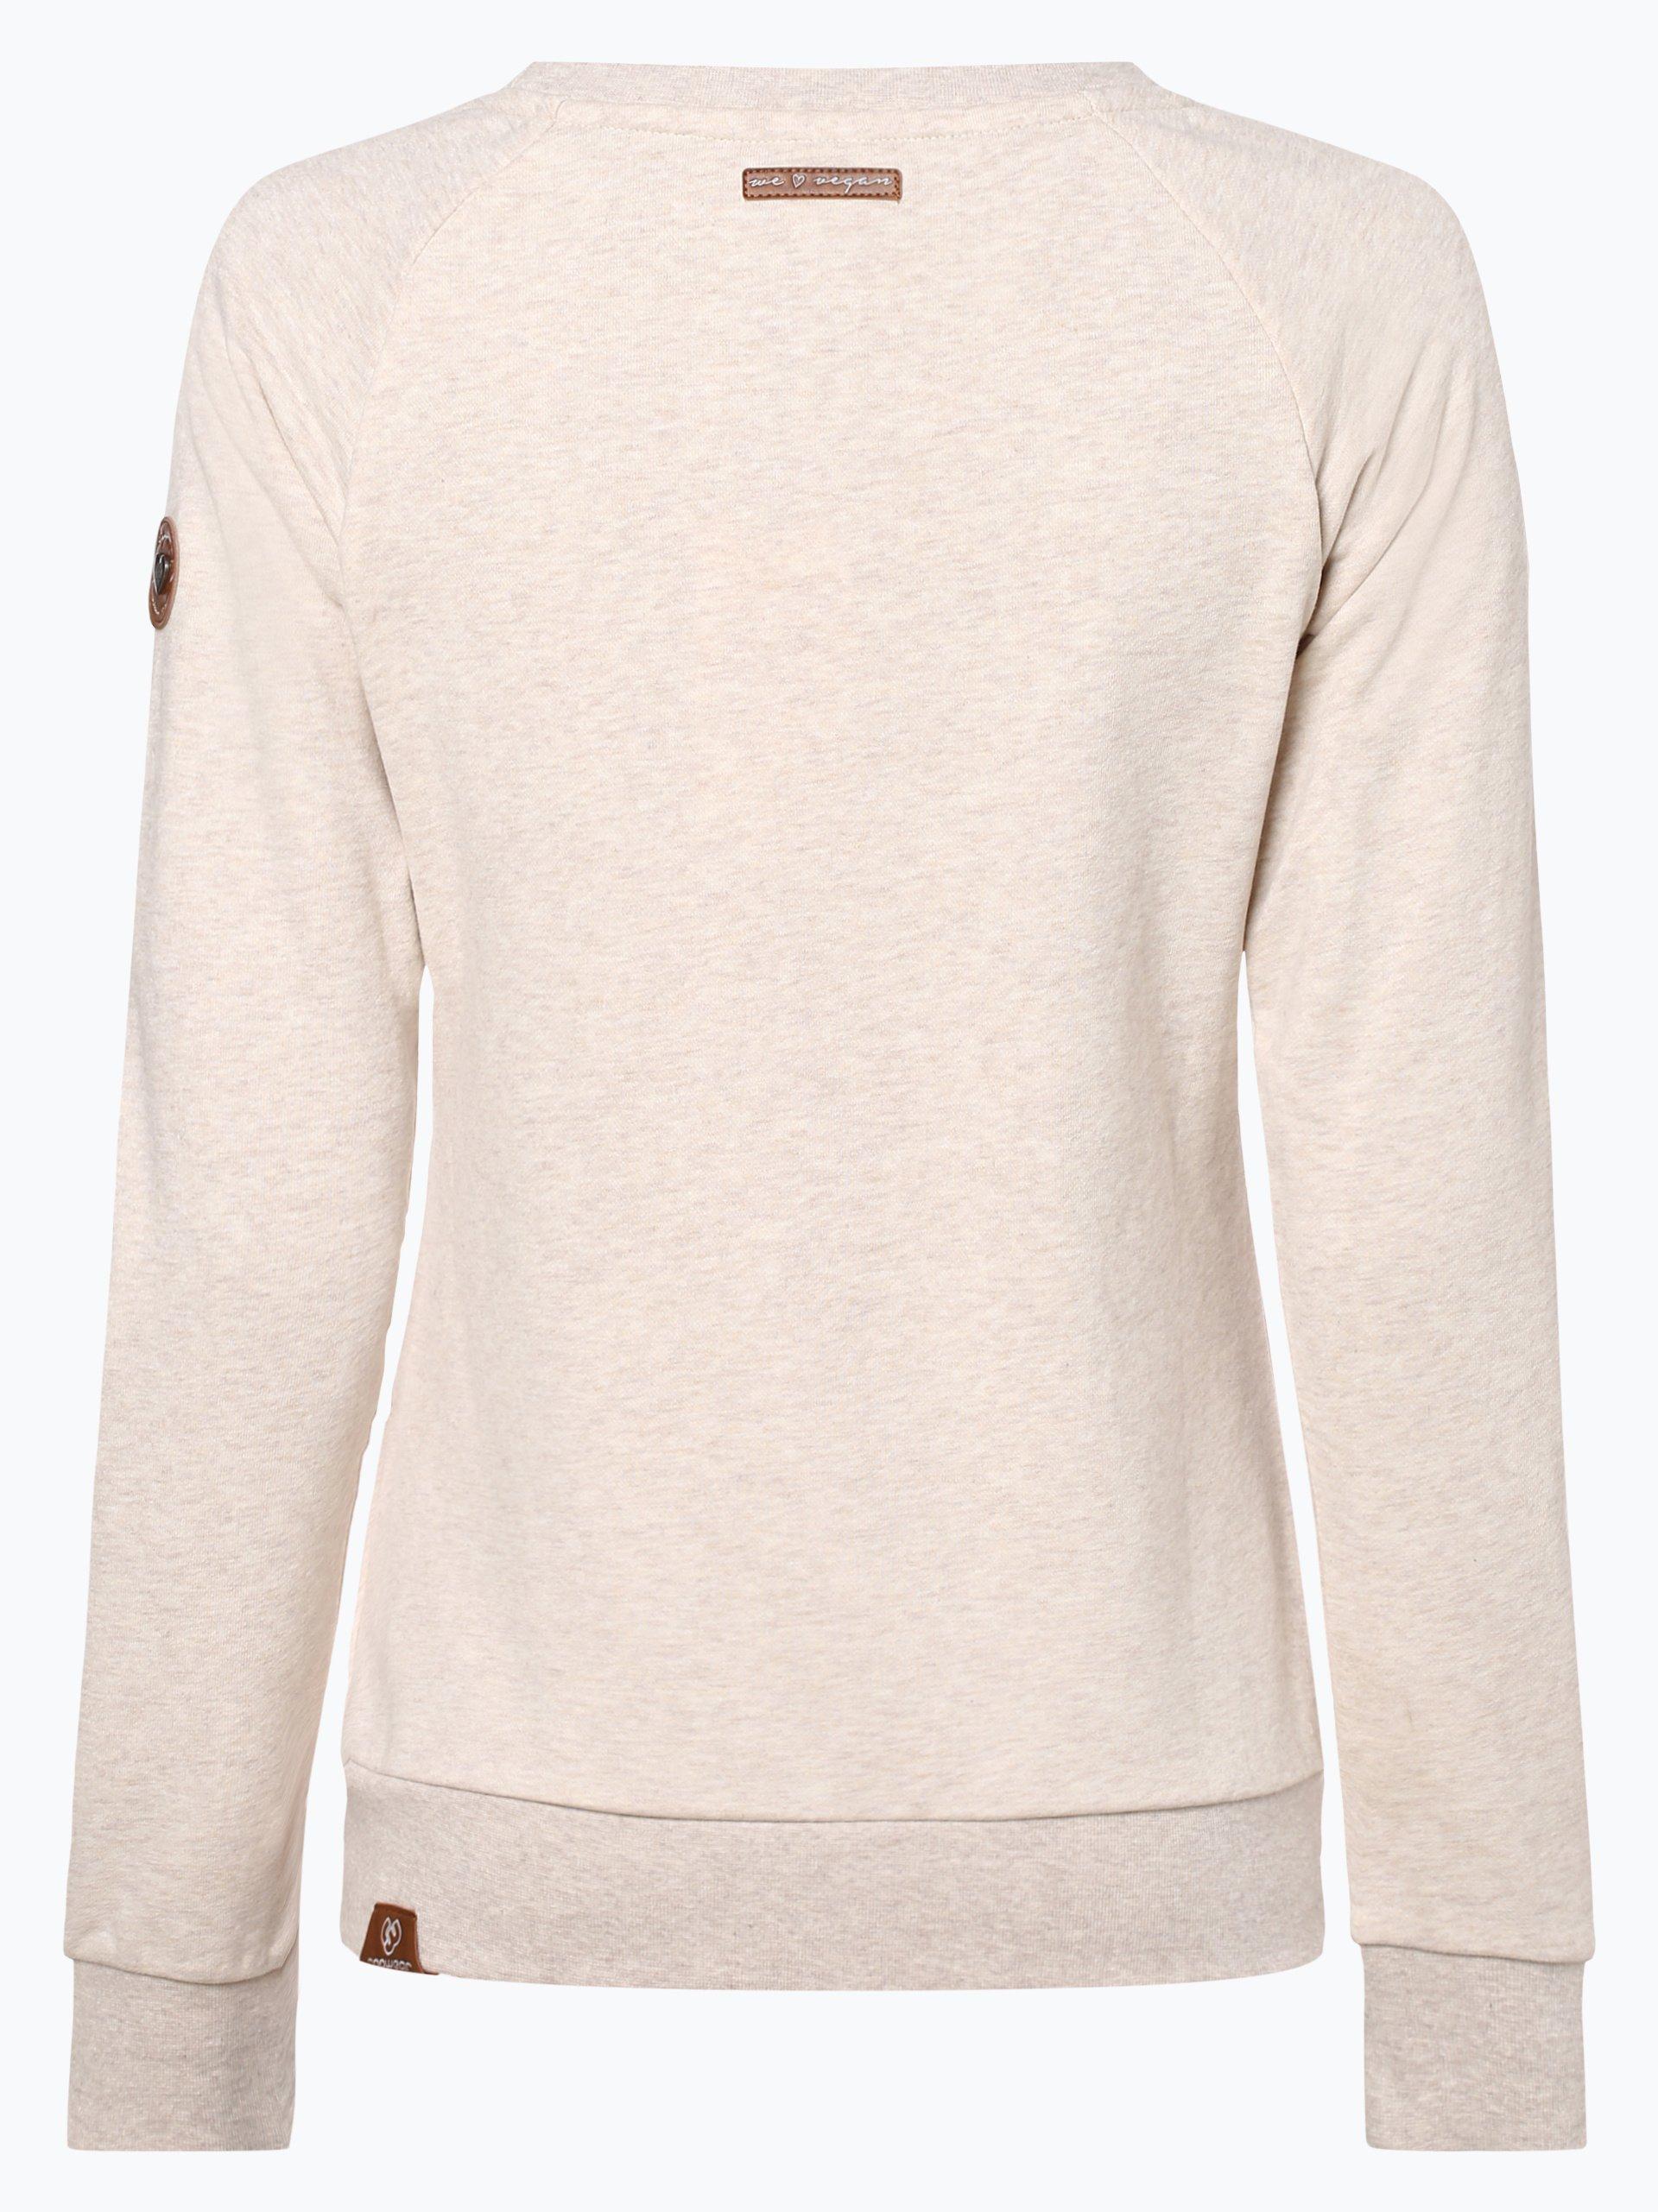 Ragwear Damen Sweatshirt - Daria